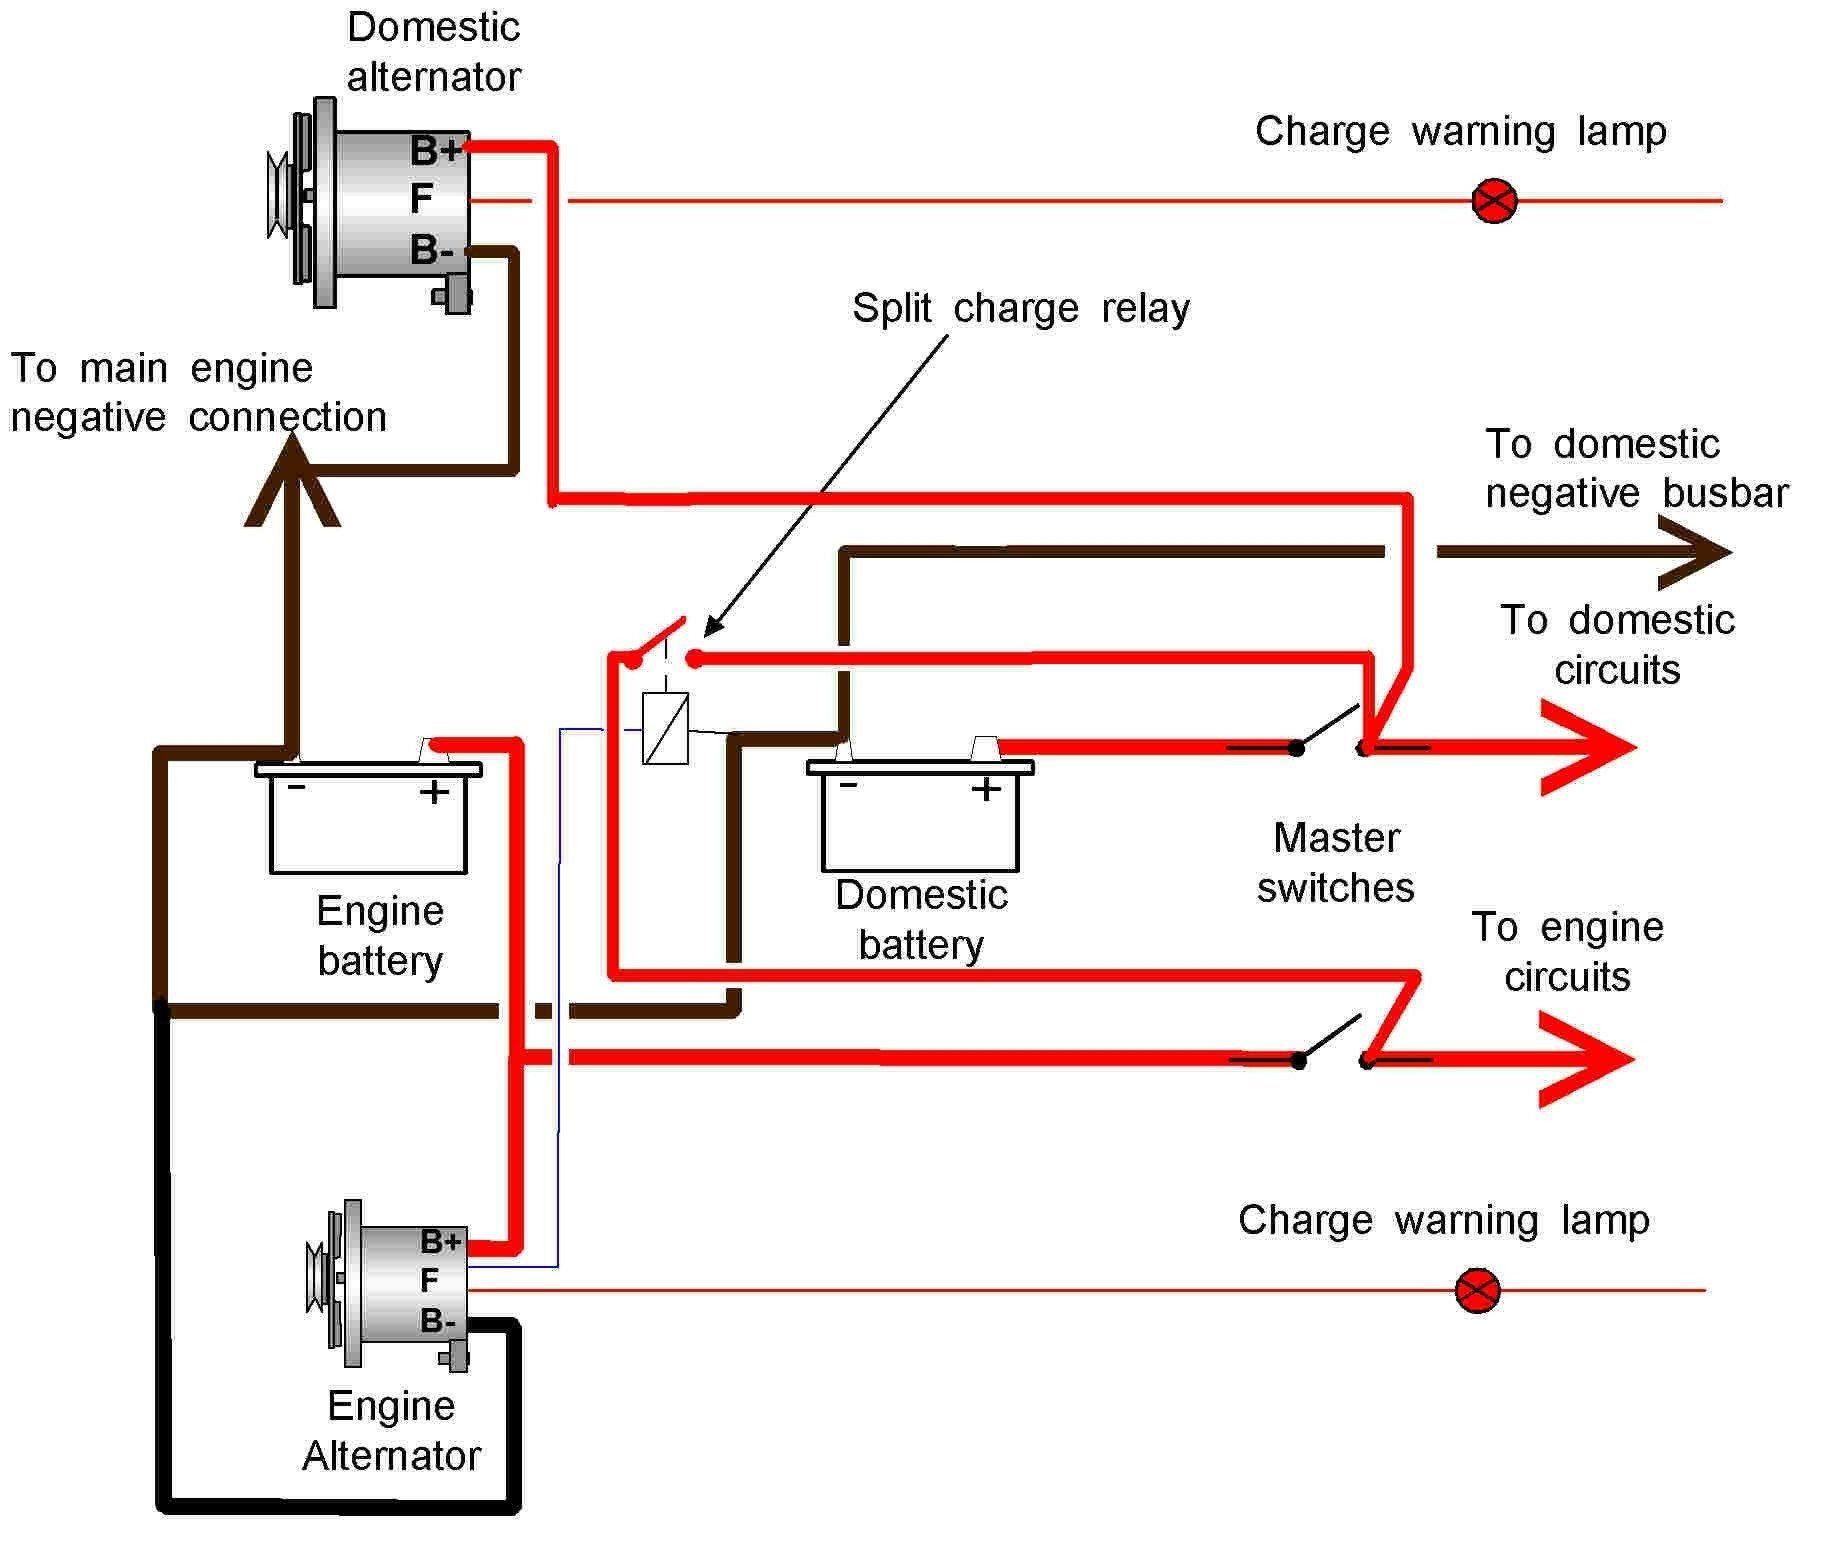 hight resolution of marine alternator wiring diagram wiring diagram load motorola marine alternator wiring diagram marine alternator wiring diagram